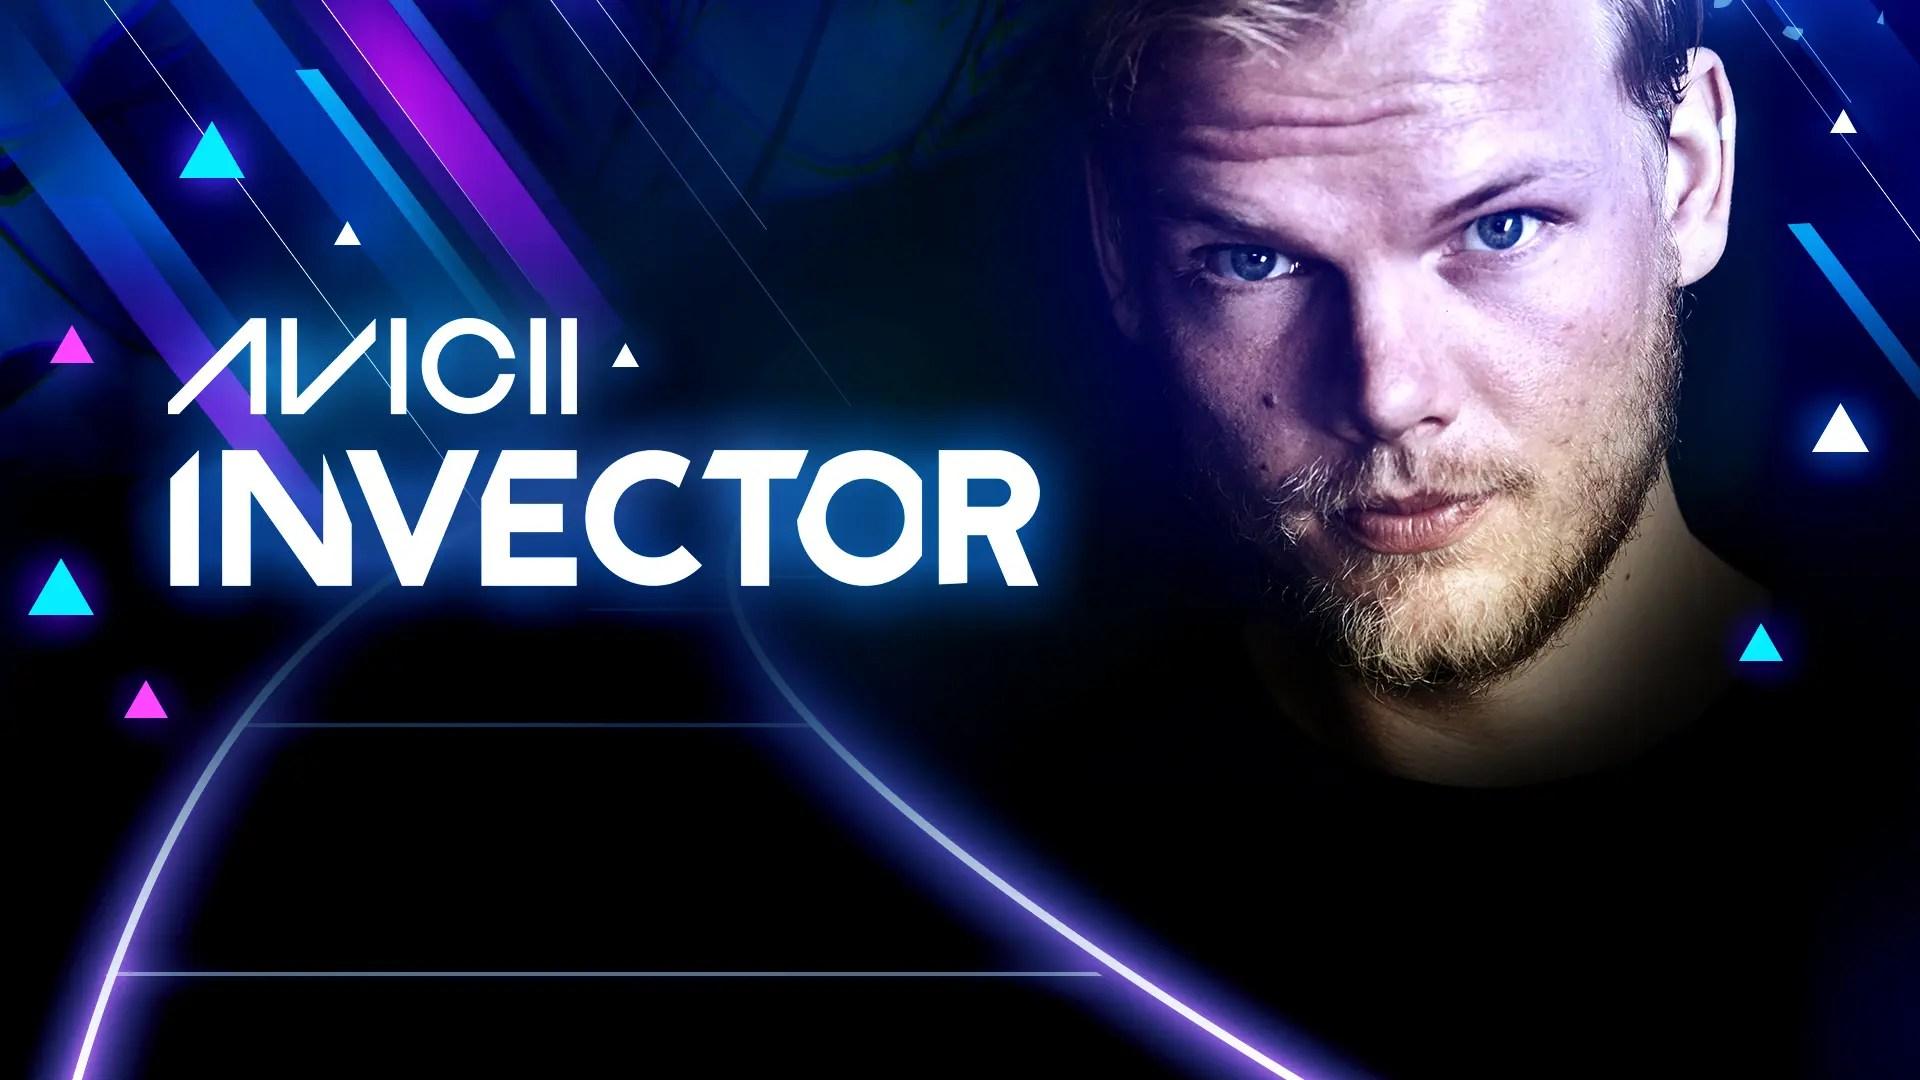 AVICII Invector Celebrates The Swedish DJ's Music On Nintendo Switch This Winter - Nintendo Insider